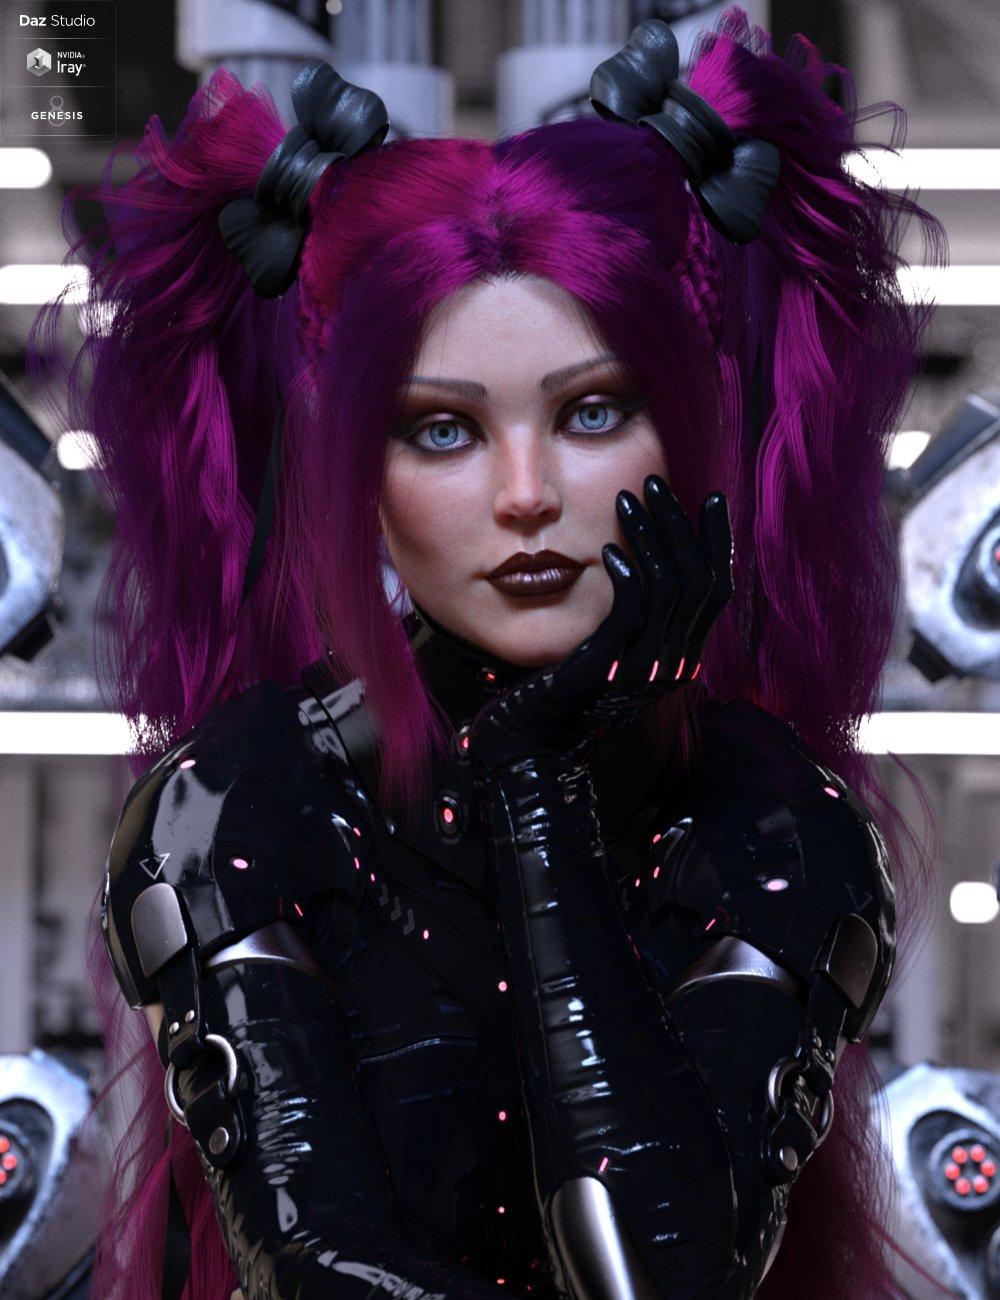 dForce Xariah Dual Ponytails Hair for Genesis 8 Female(s) by: HM, 3D Models by Daz 3D